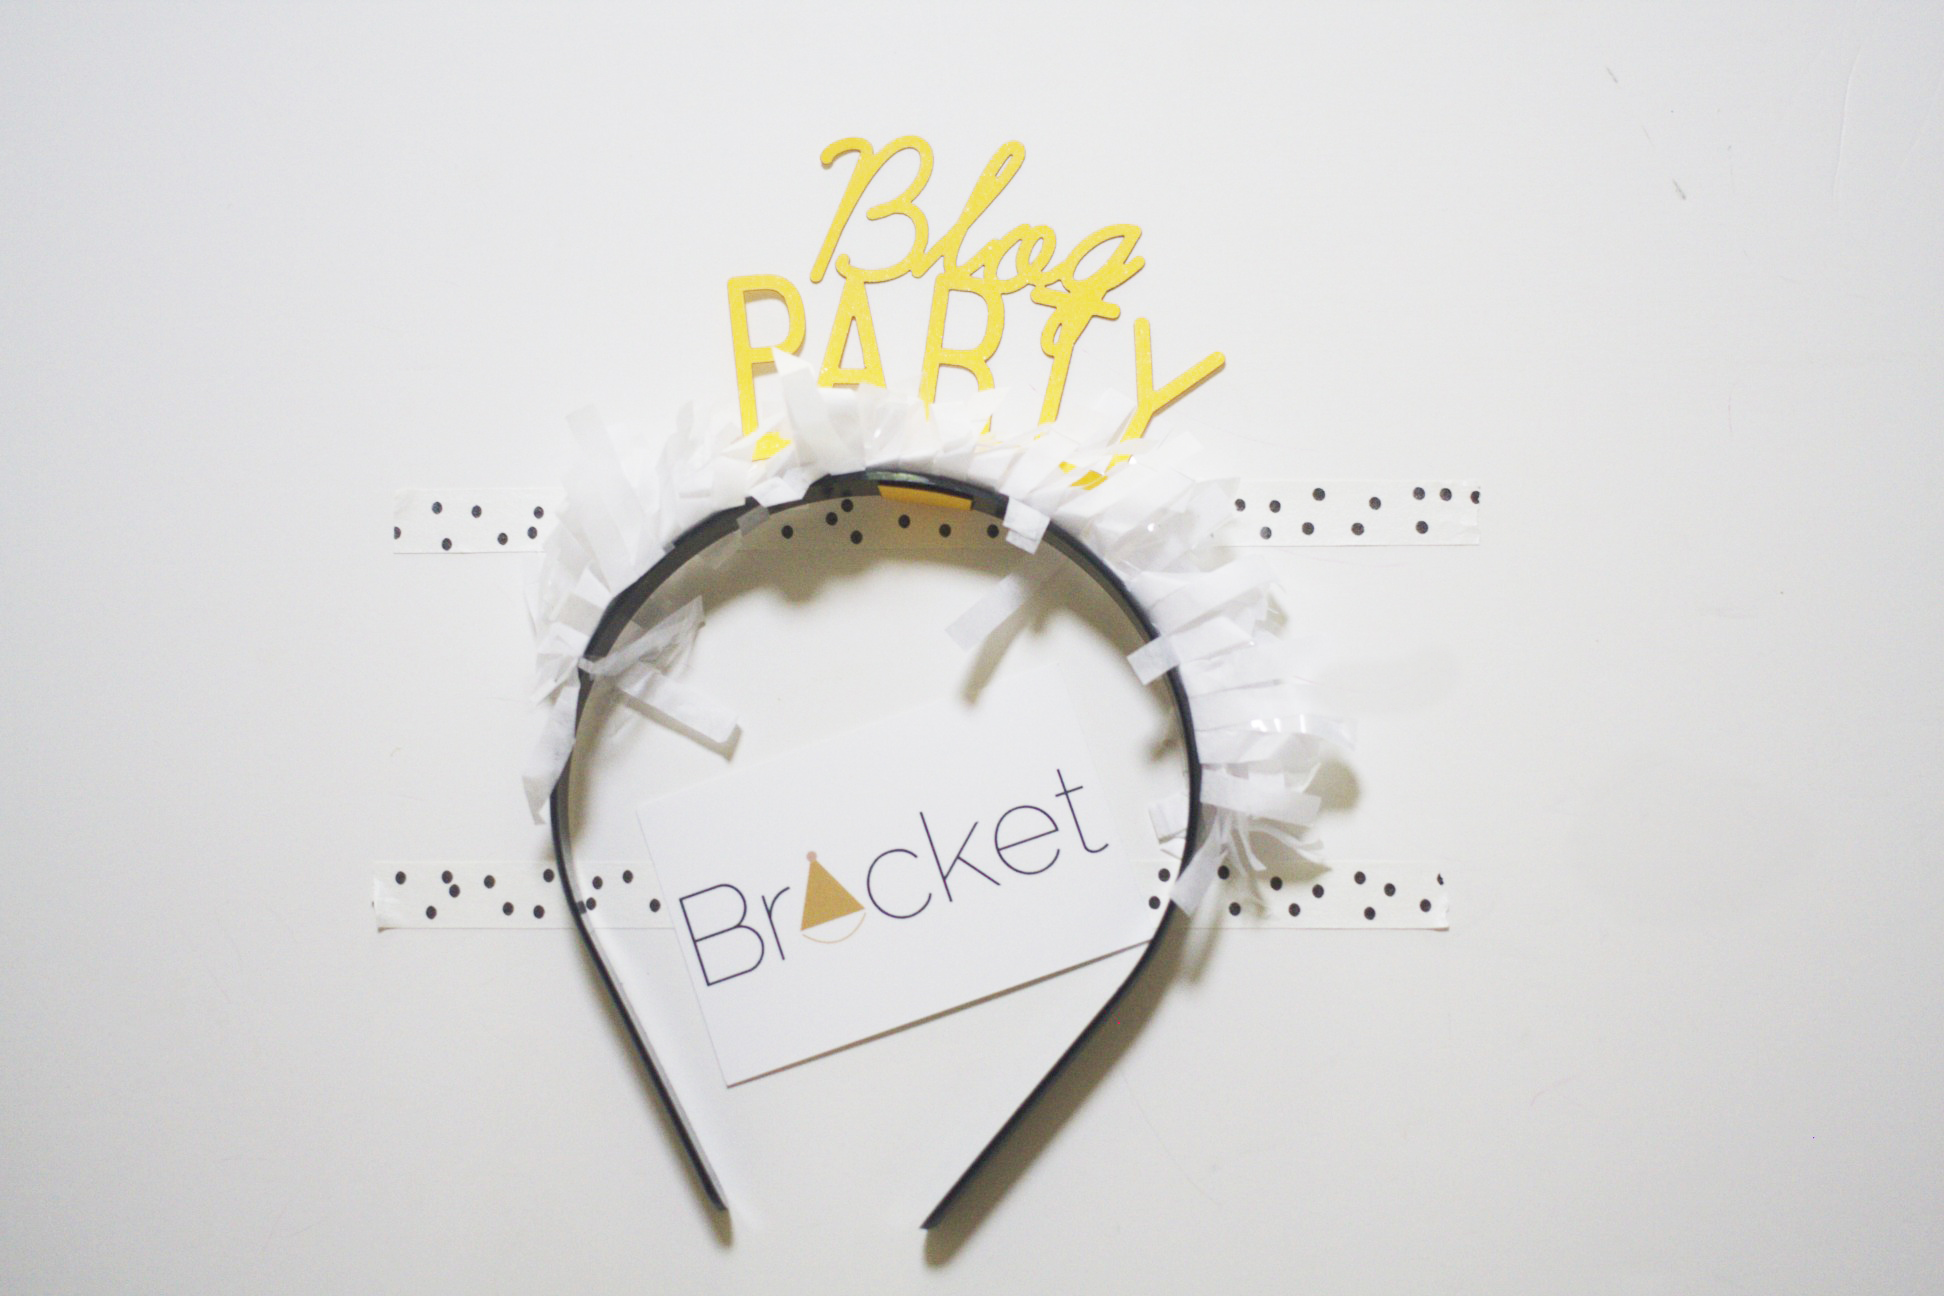 Custom party goods shop,  Bracket , made us these amazing custom Blog Party headbands.